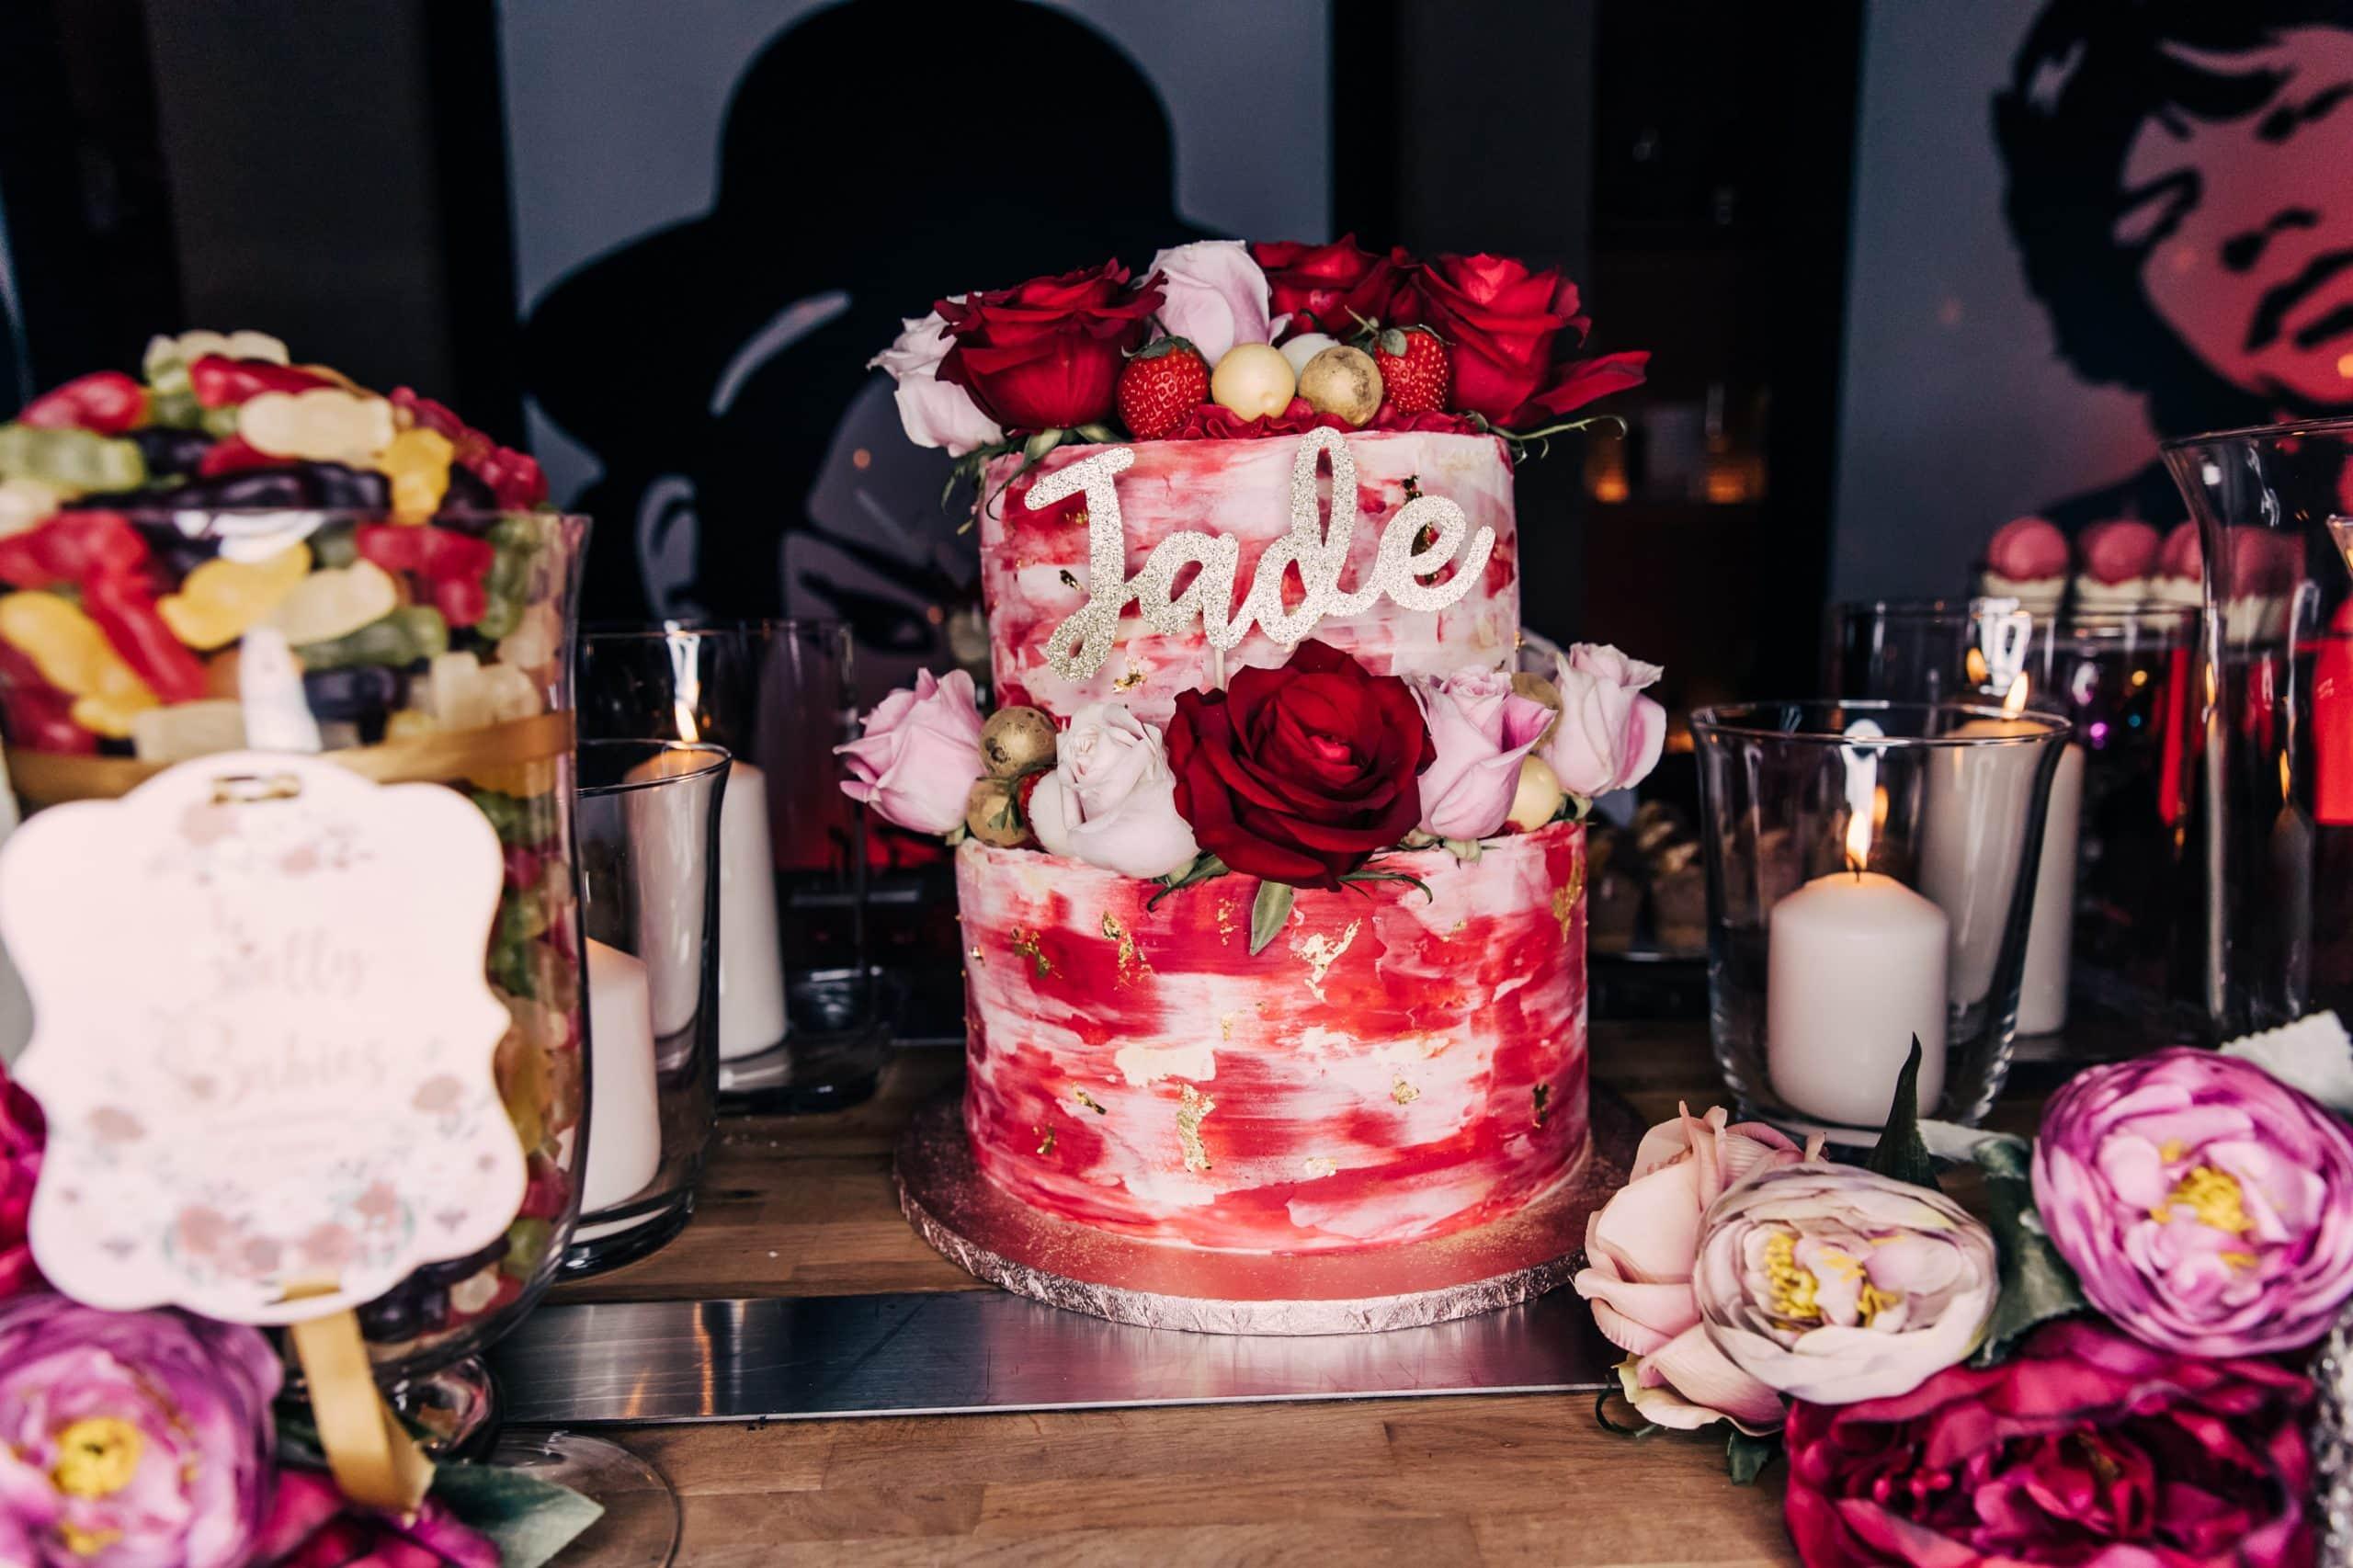 Jade Thirlwall - Little Mix - Birthday 2018